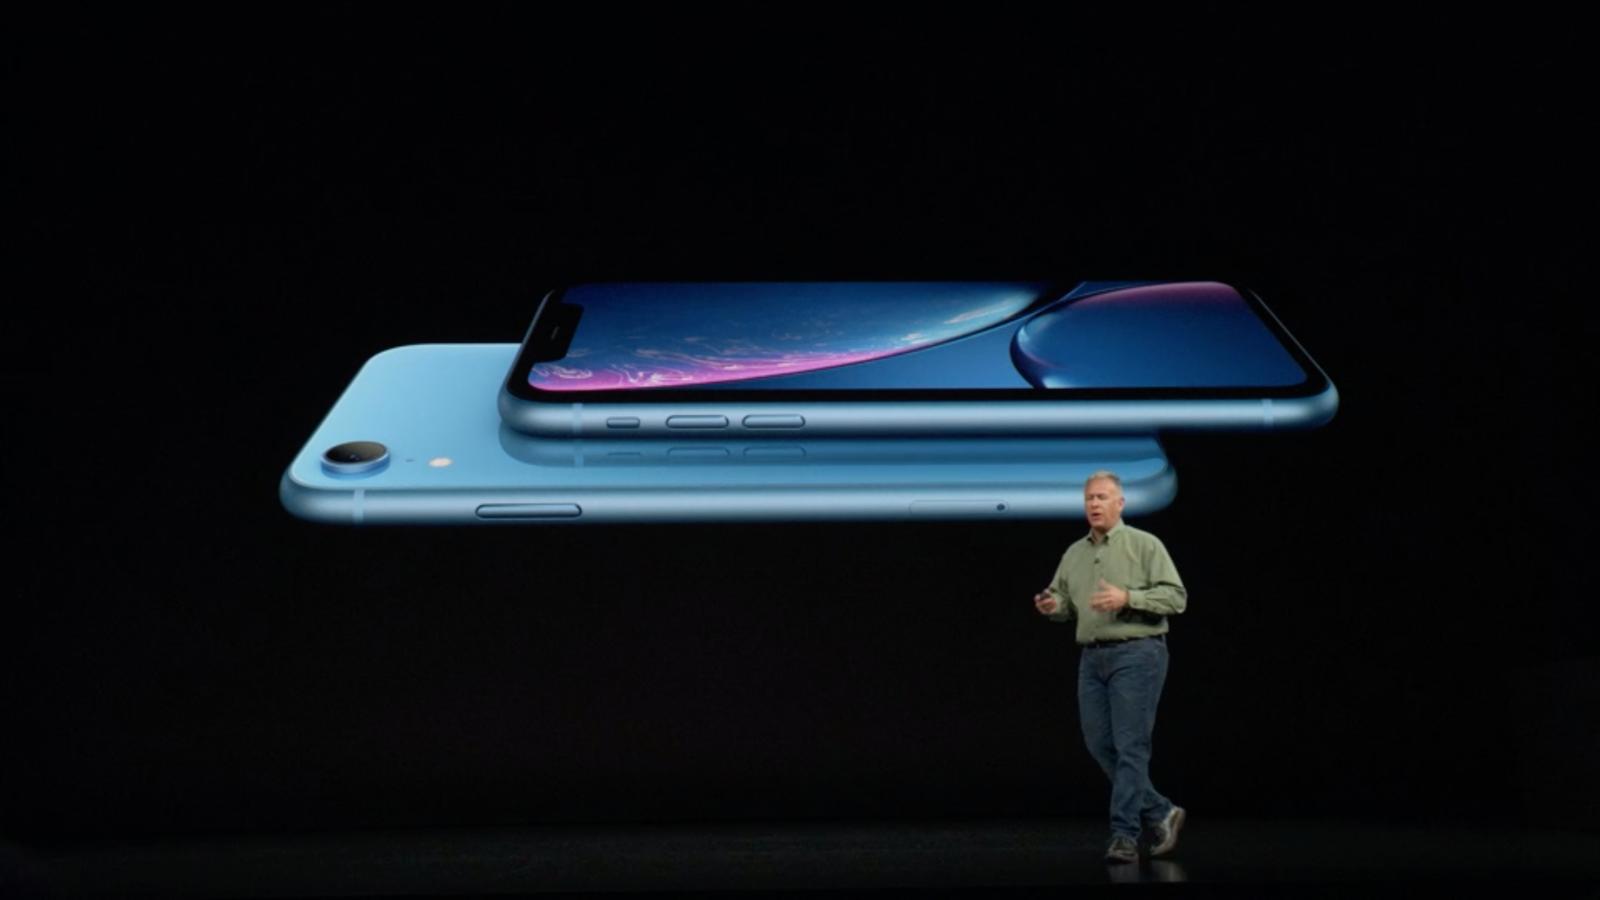 iPhone-XR best selling 2018 model